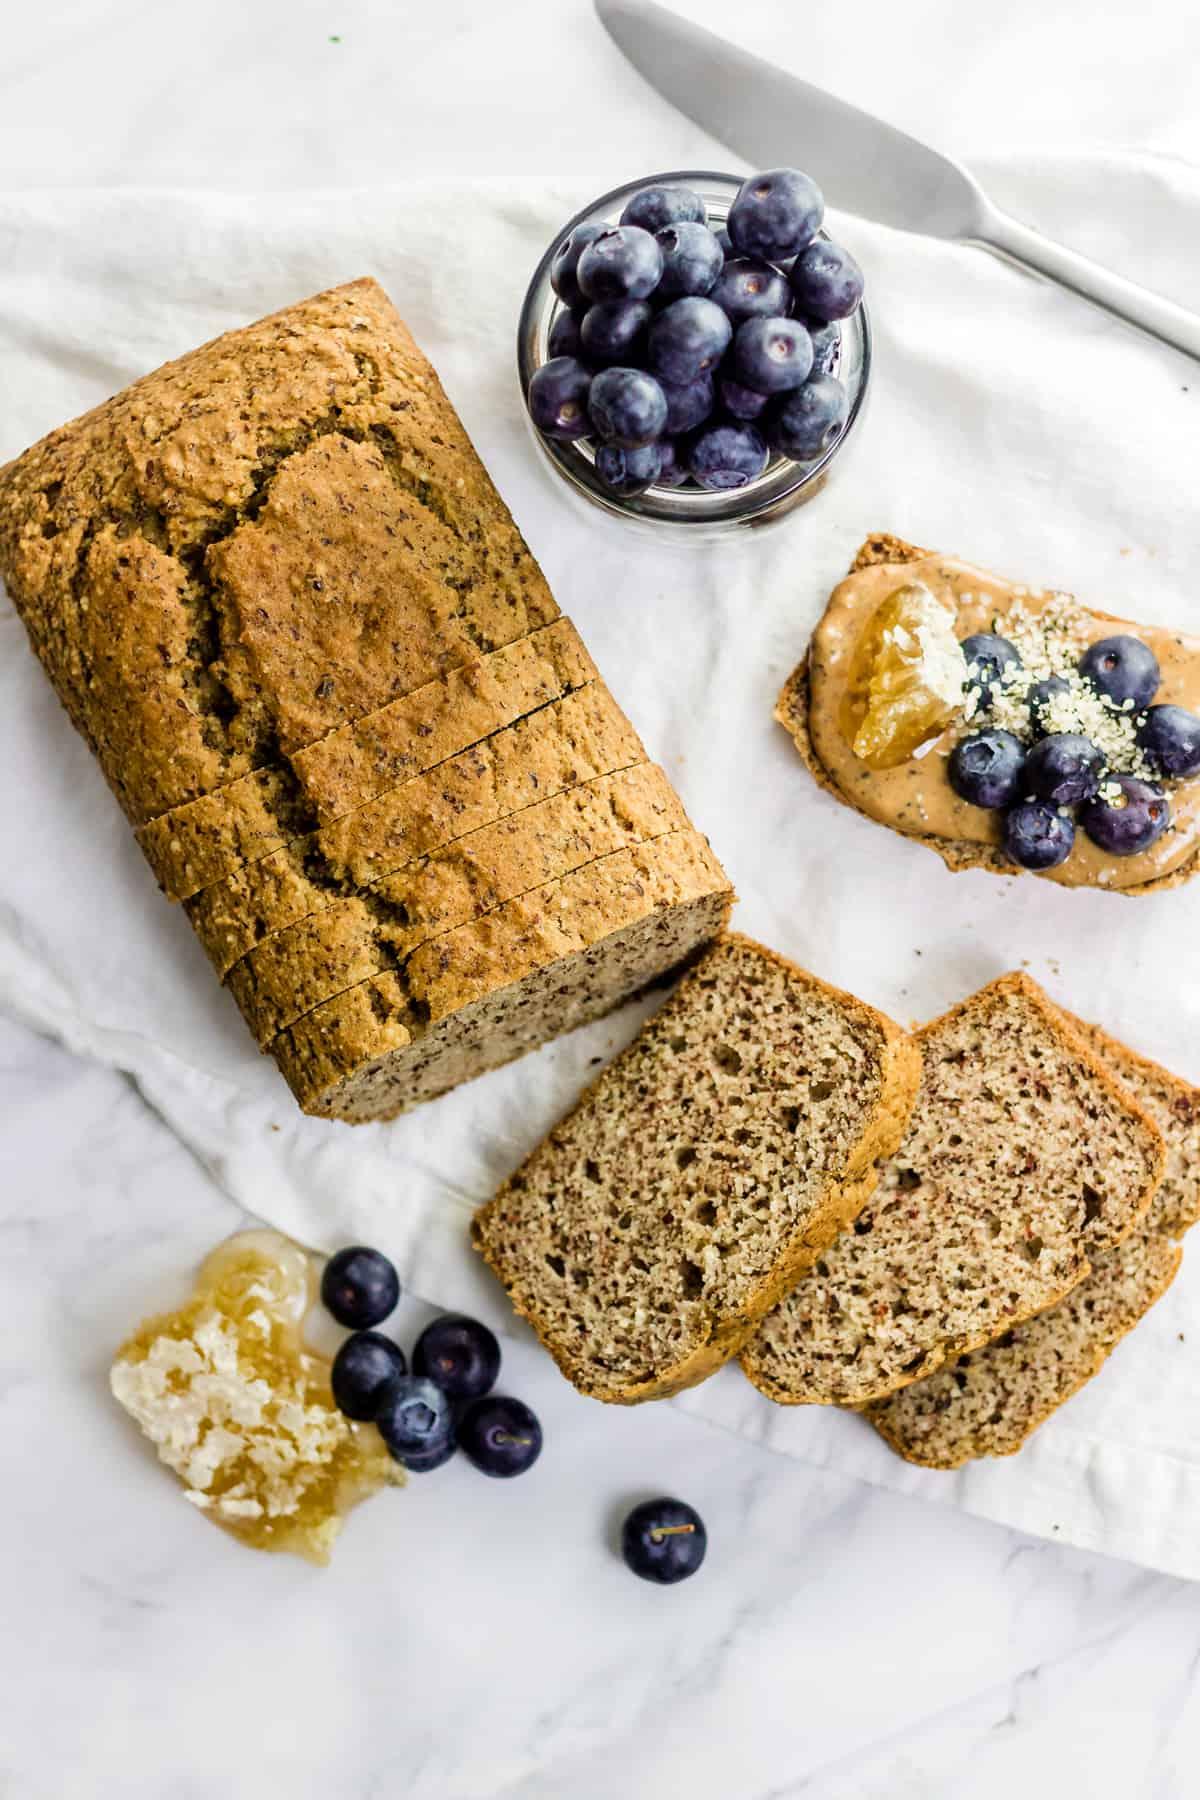 The BEST Paleo Sandwich Bread (gluten free, grain free, yeast free, low carb)